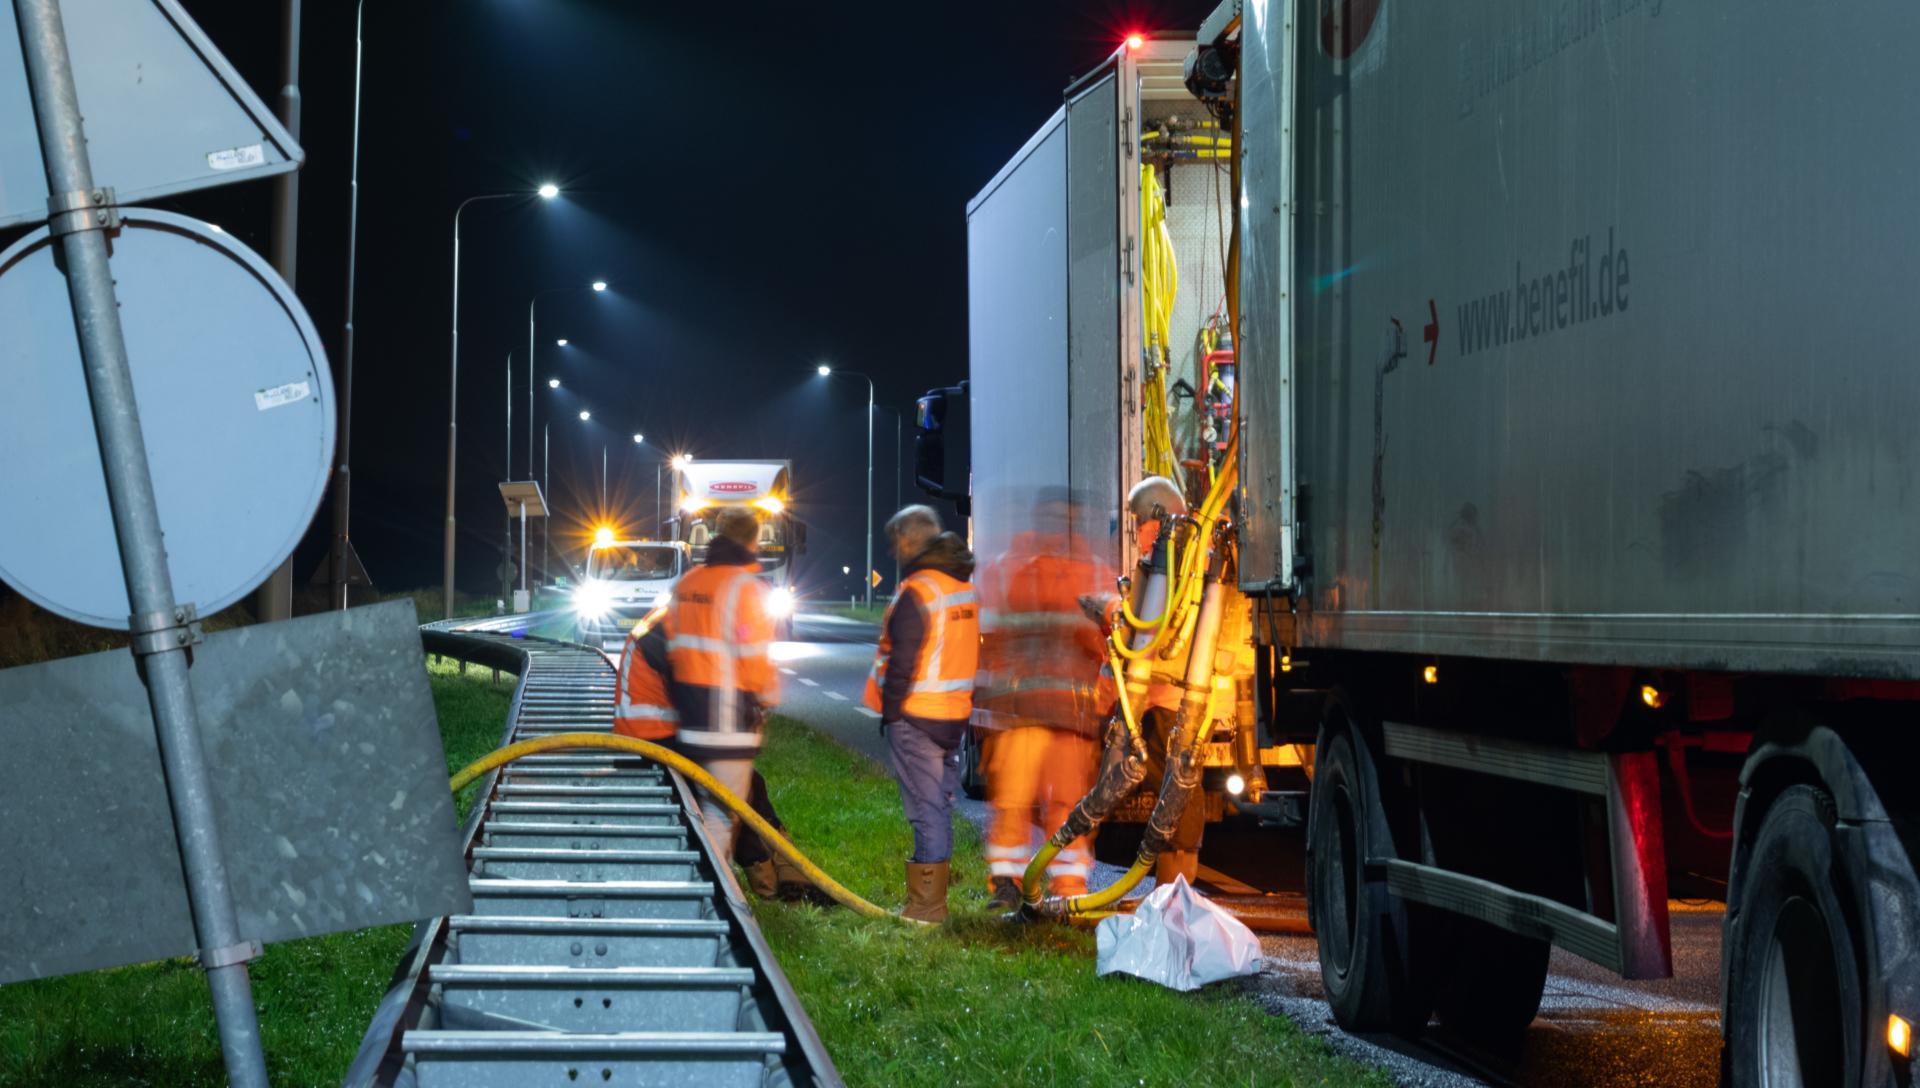 Truck on N9 - filling pipelines